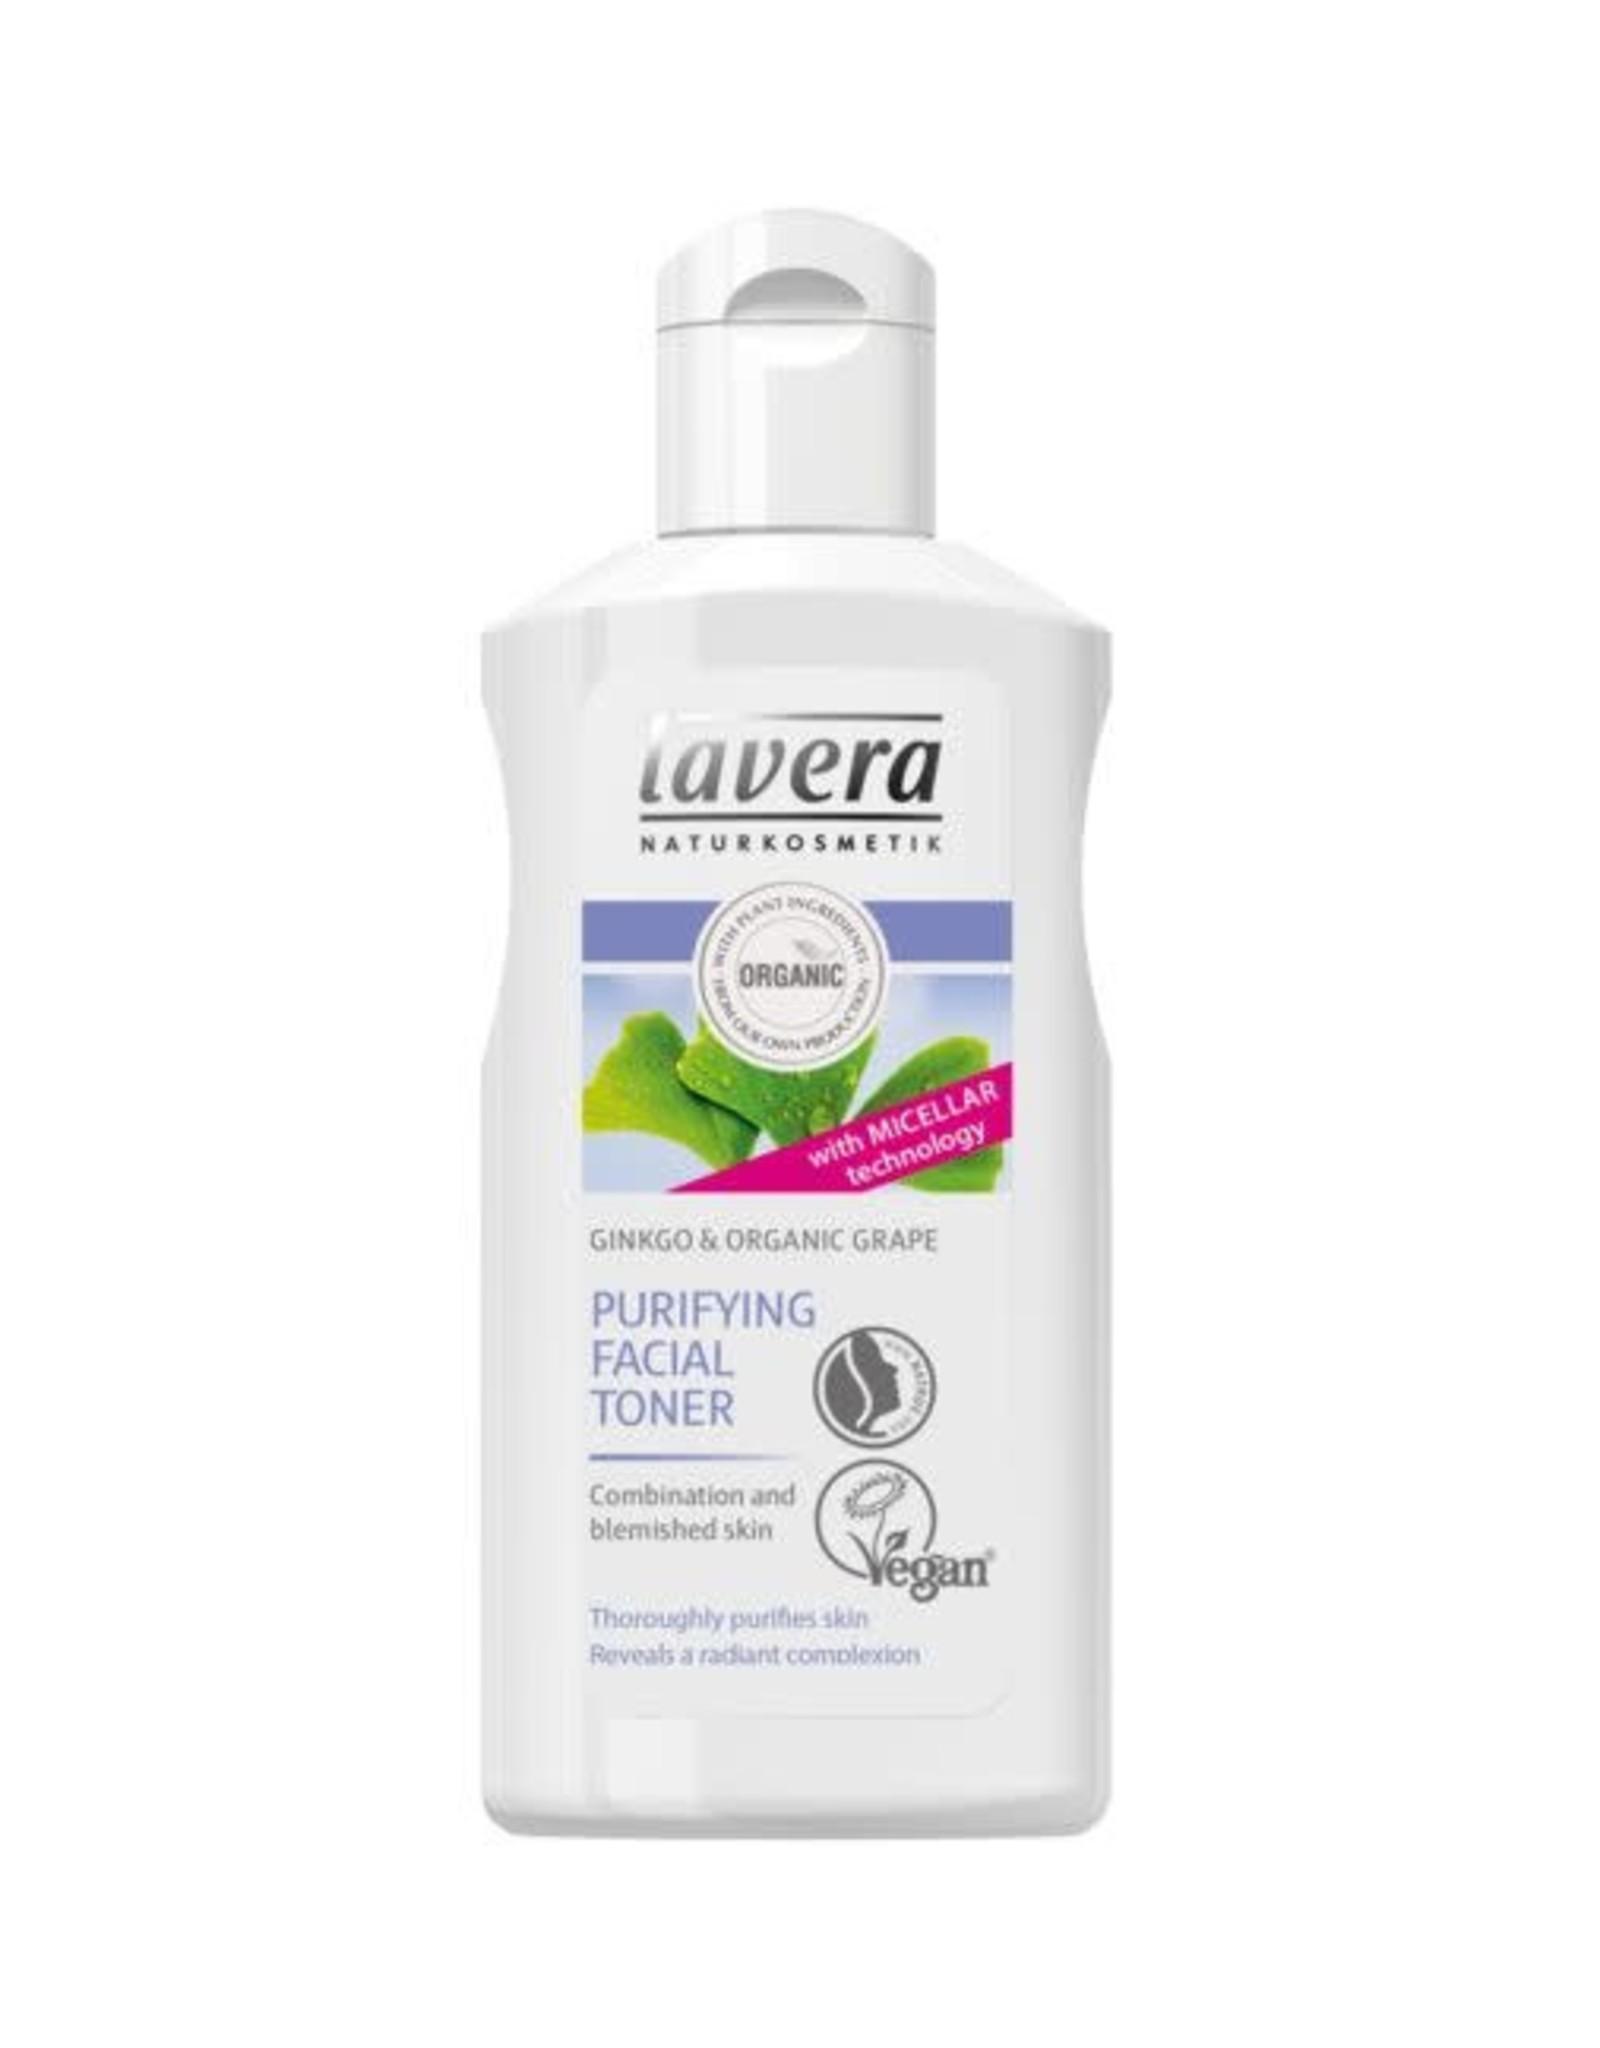 Lavera Gezichtstoner/facial toner gentle - cleansing purifying Ginko 125 ml